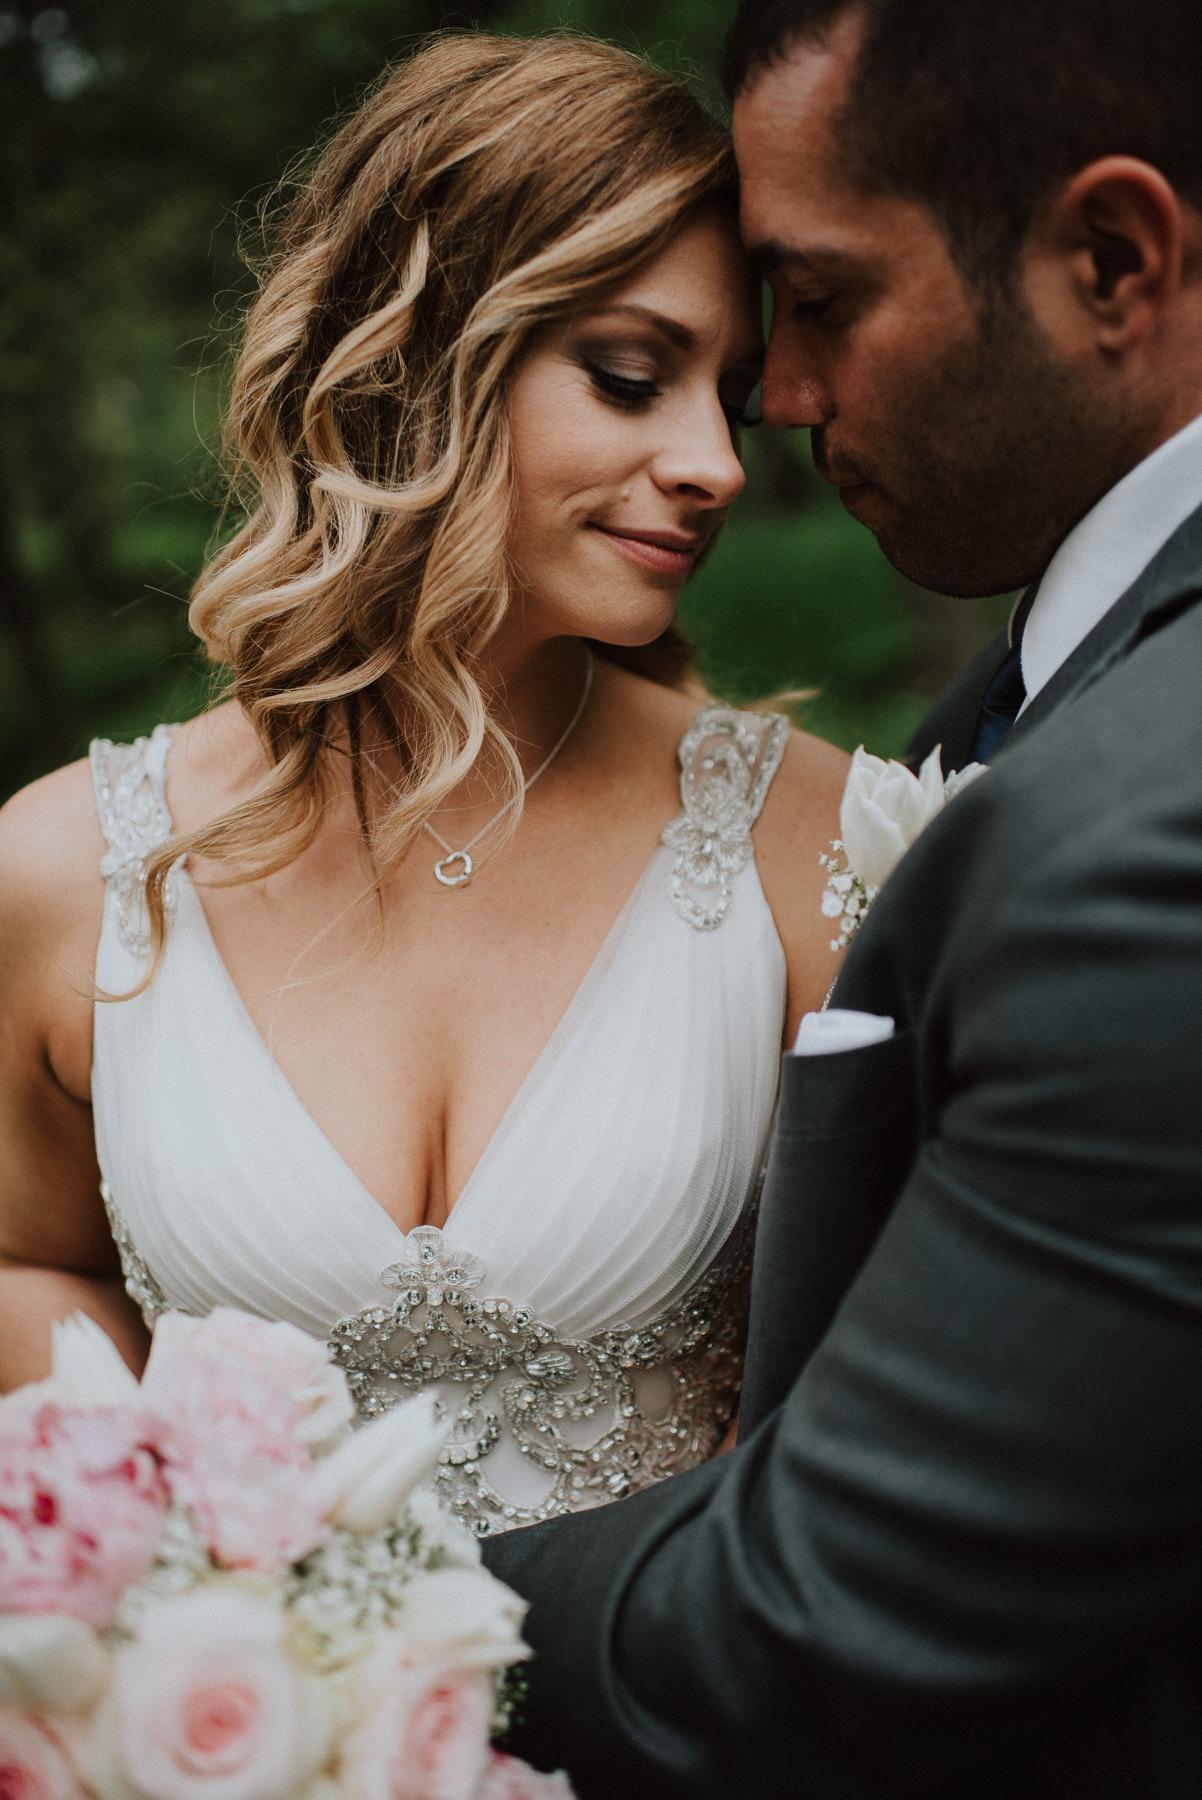 appleford-estate-wedding-photography-43.jpg